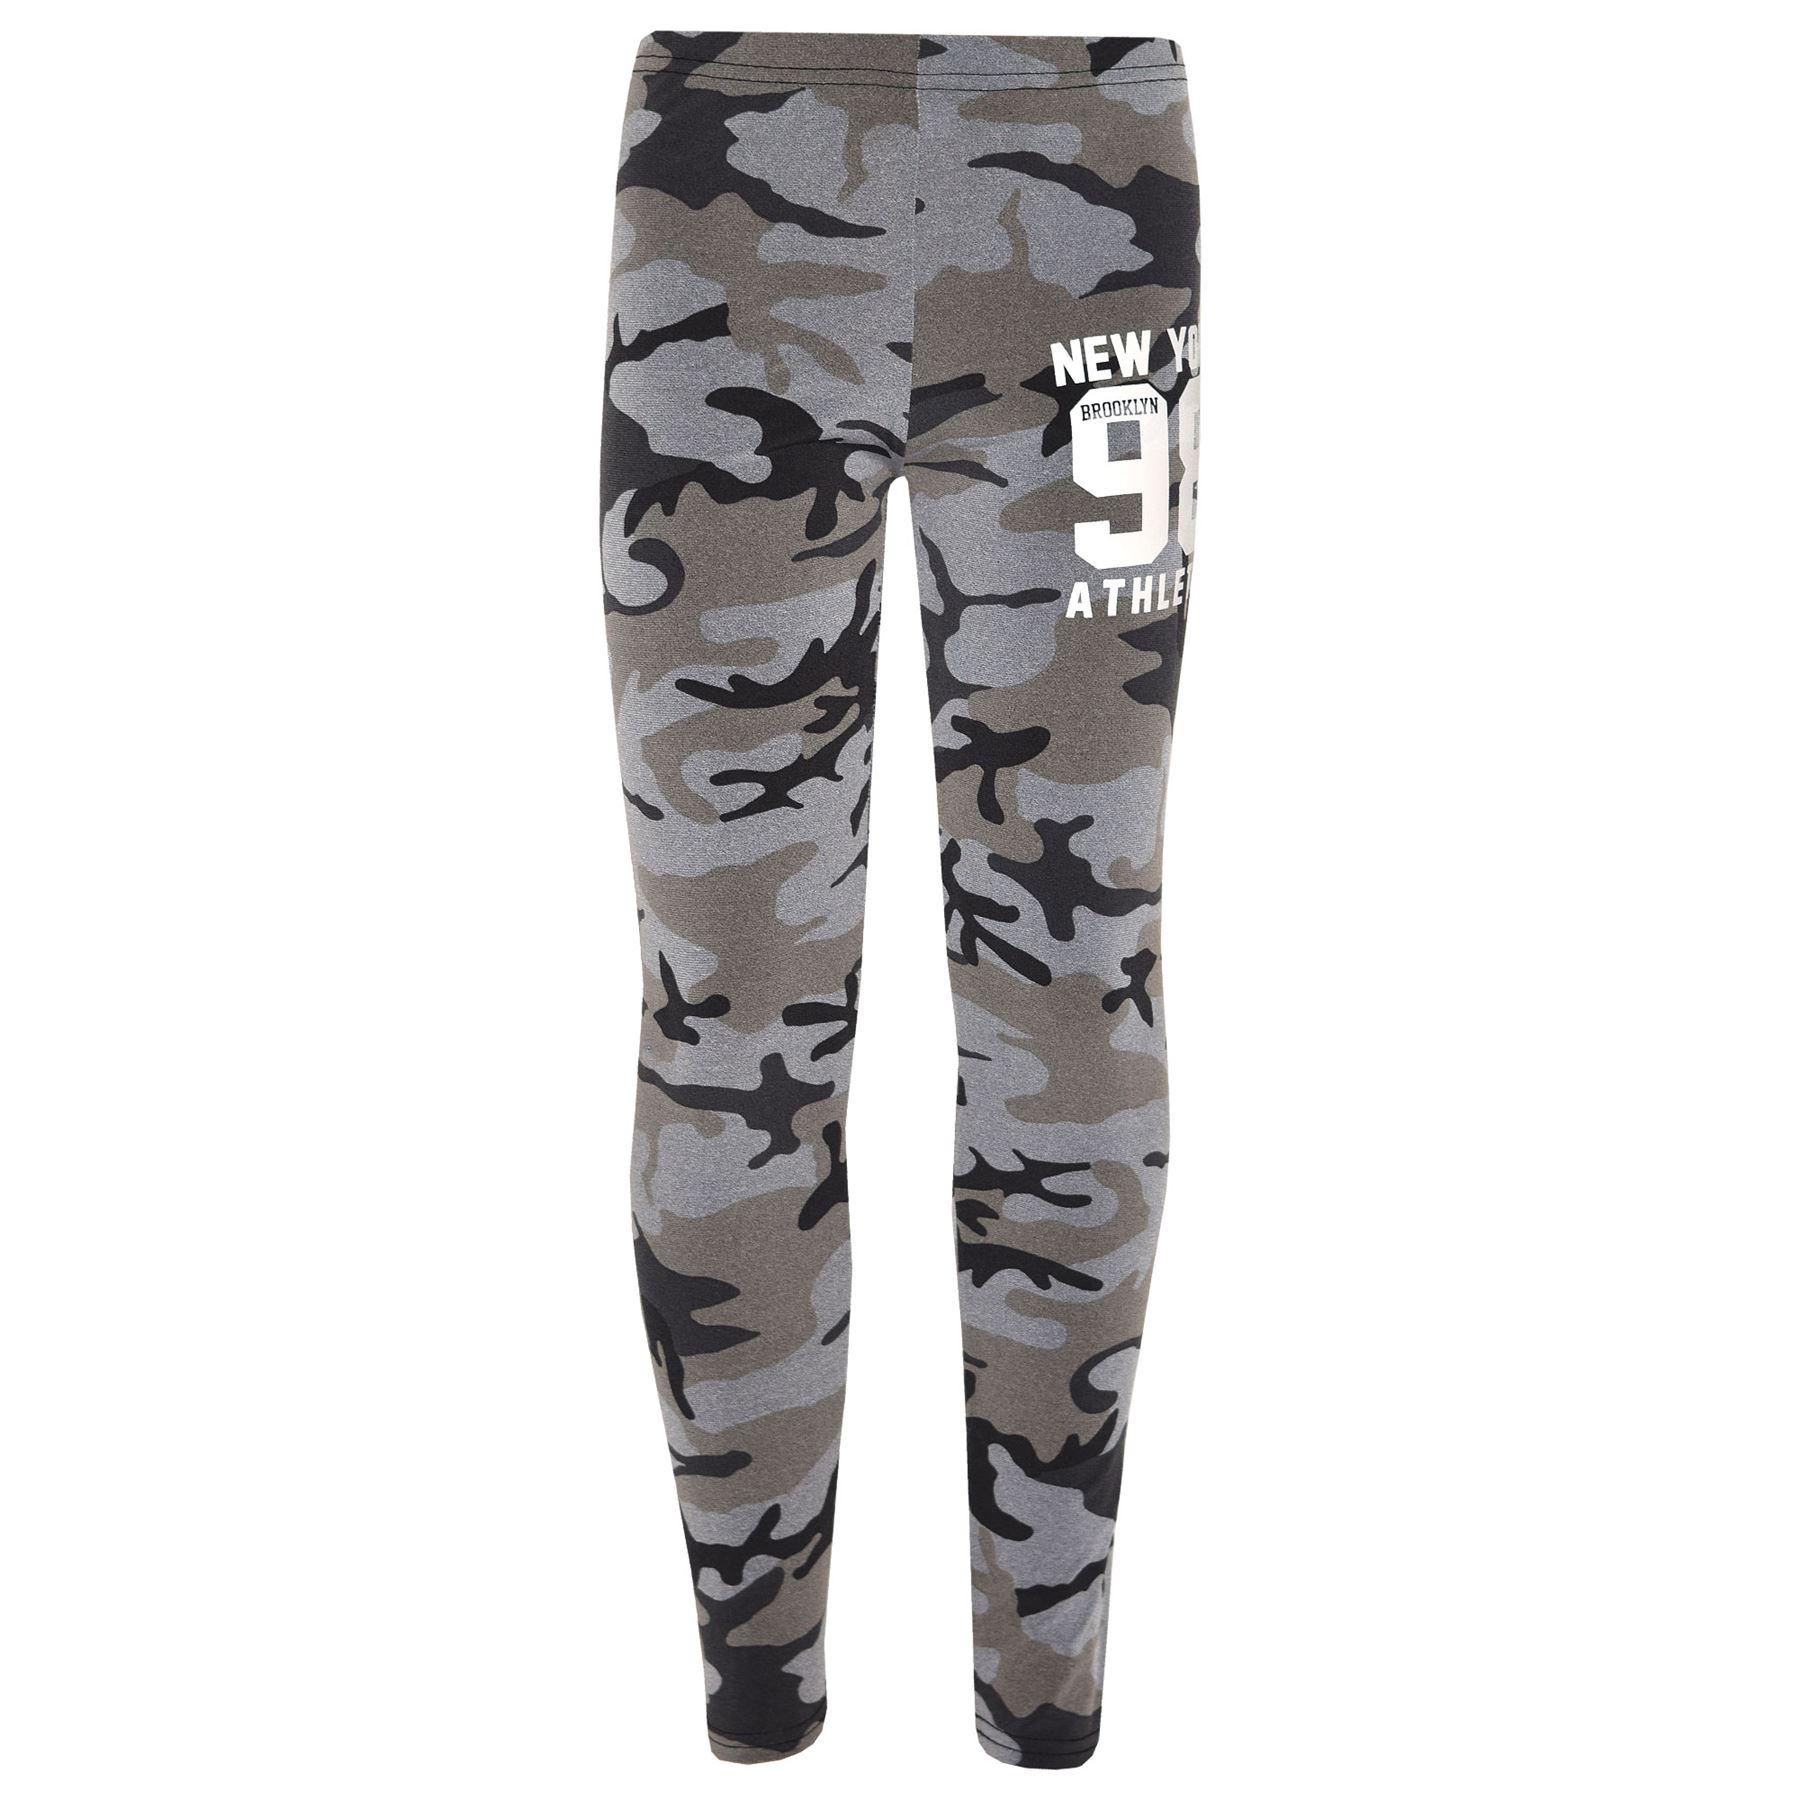 Girls-NEW-YORK-BROOKLYN-98-ATHLECTIC-Camouflage-Print-Top-amp-Legging-Set-7-13-Yr thumbnail 12